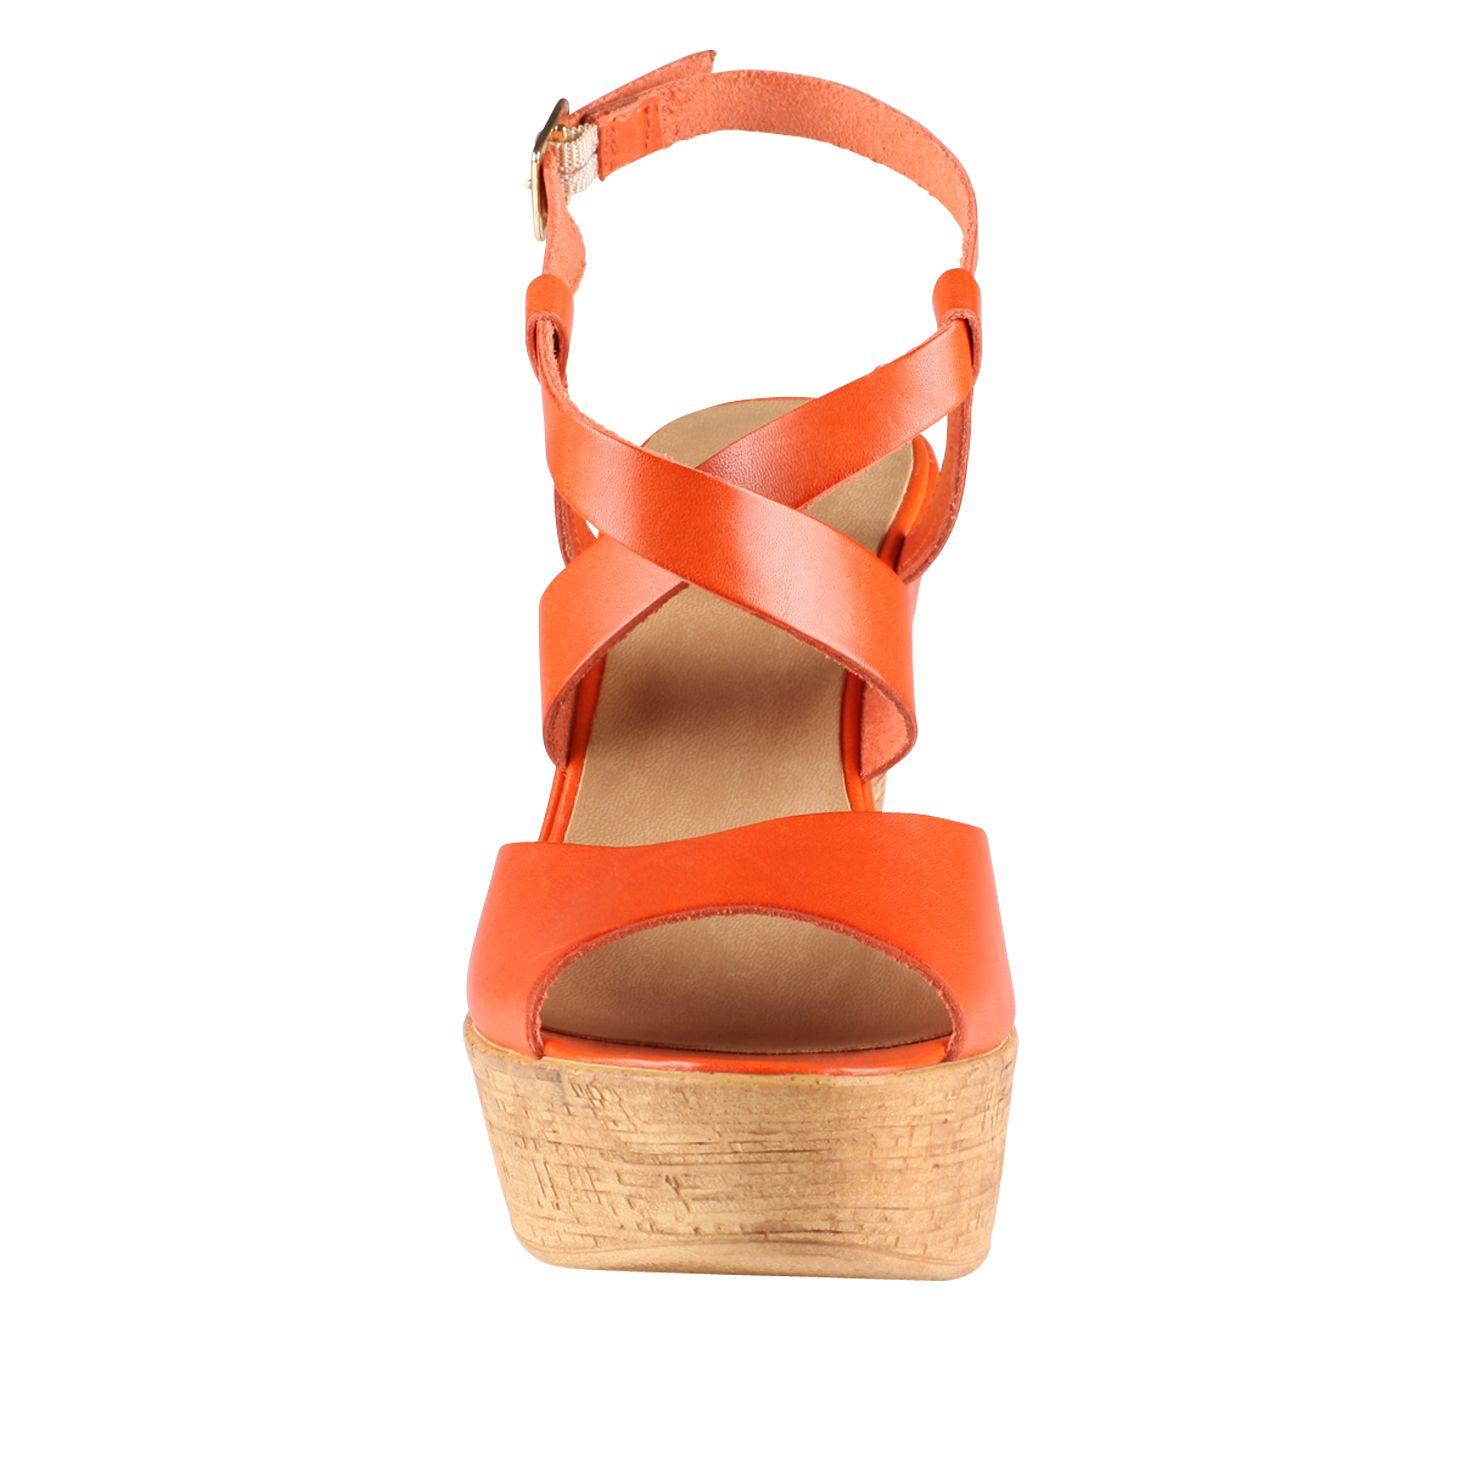 aldo dradolle ankle wedge sandals in orange lyst